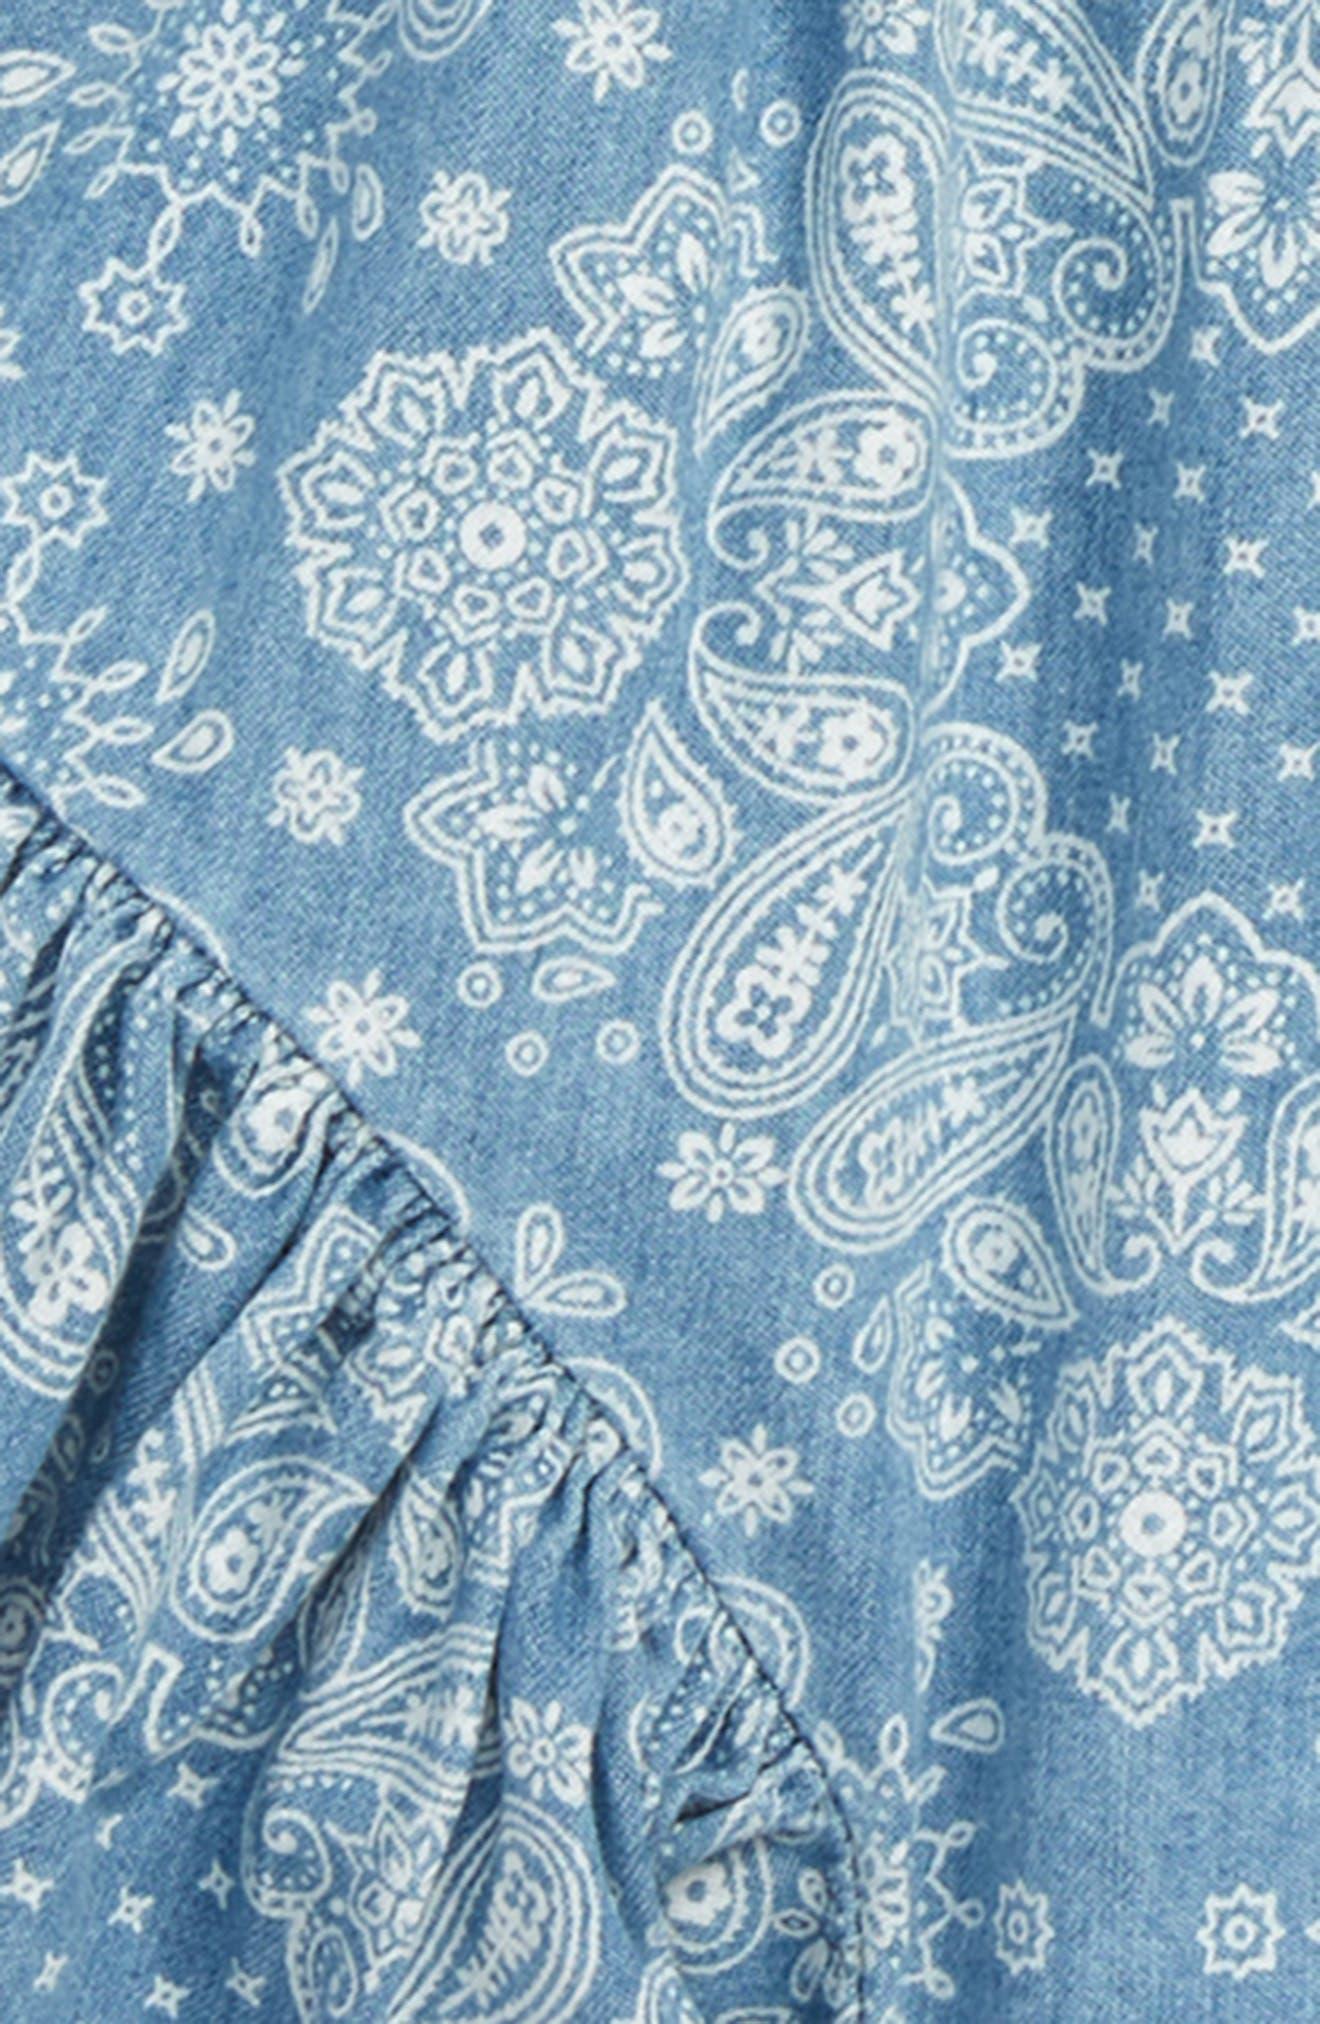 Bandana Print Ruffle Shorts,                             Alternate thumbnail 2, color,                             450